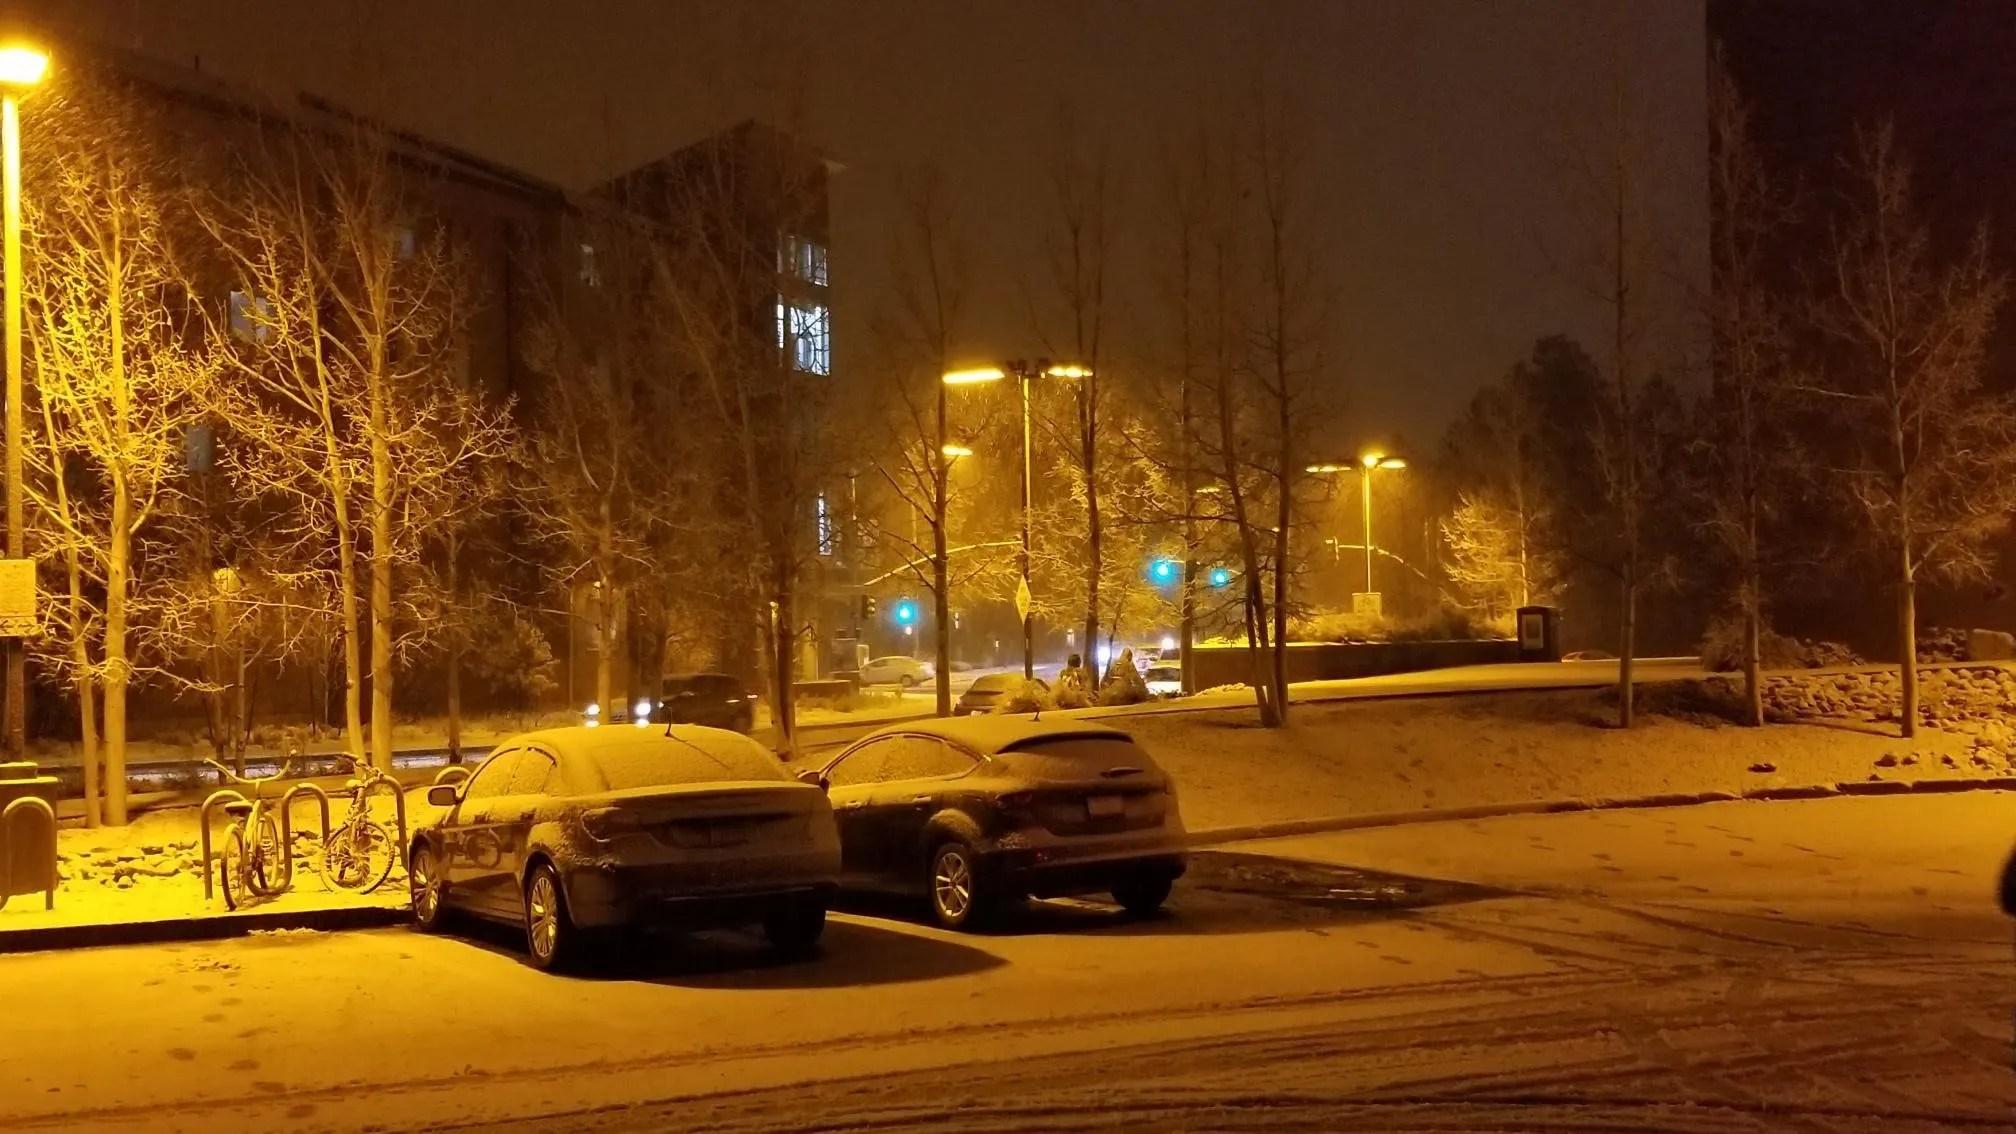 Snow in Arizona: Flagstaff Snowbowl Mogollon Rim Heber ...